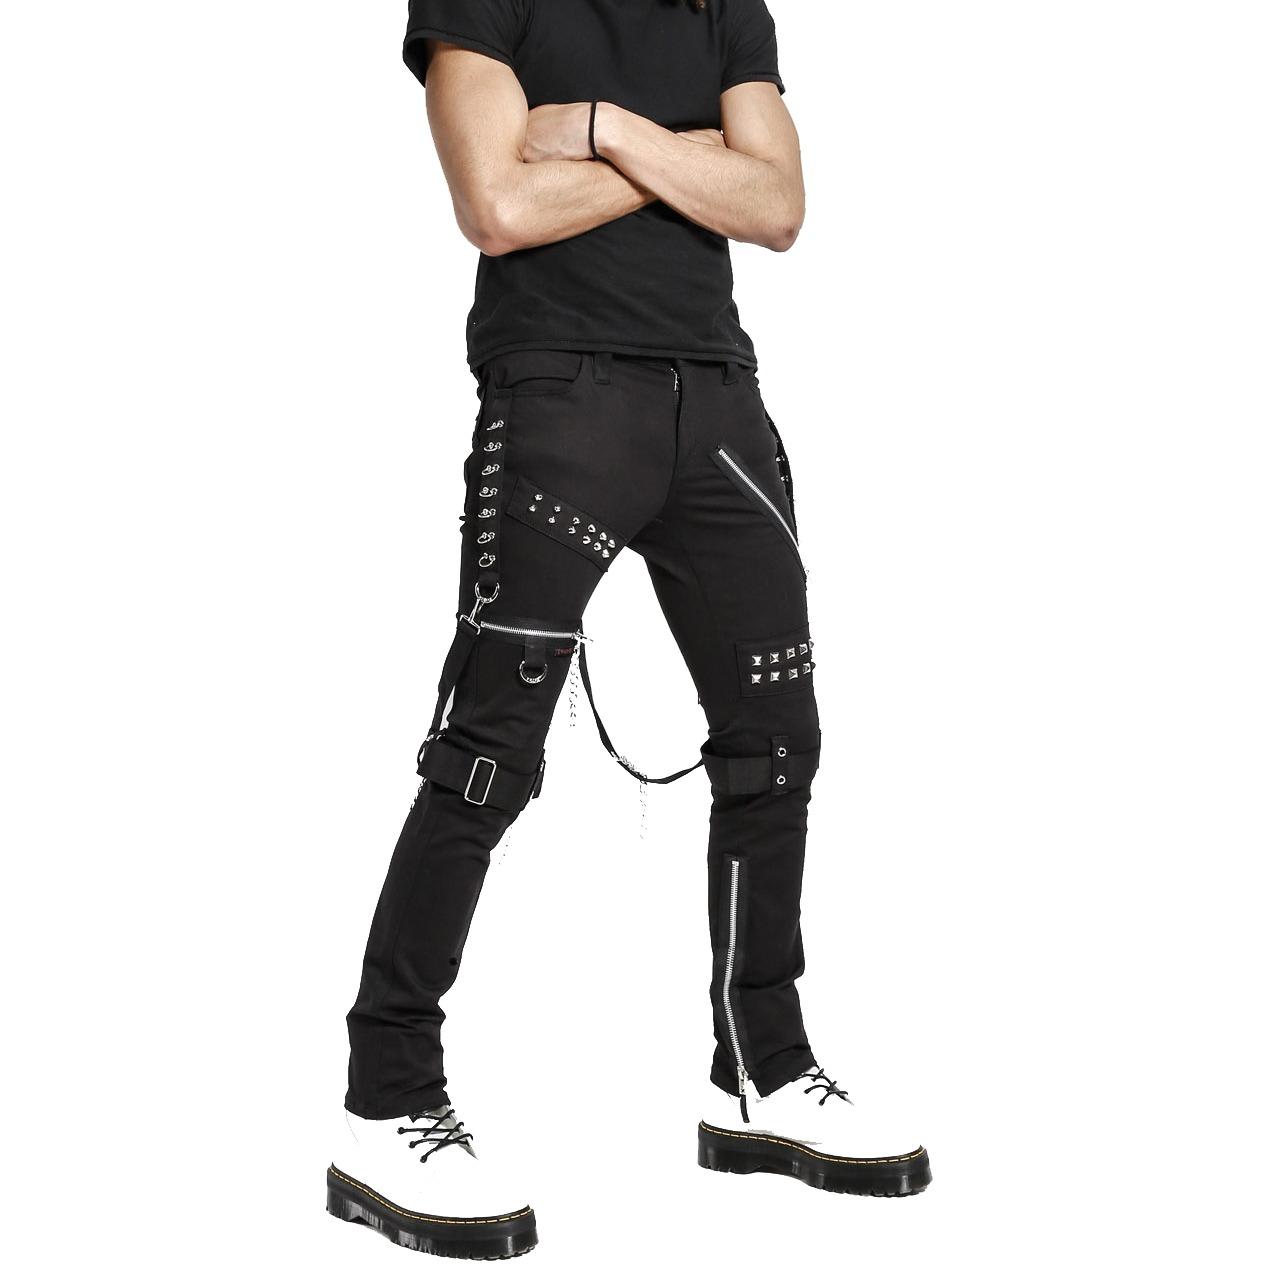 Men's Gothic Bondage Black Tripp Pant Rock Hard Trouser Heavy Weight EMO/PANTS